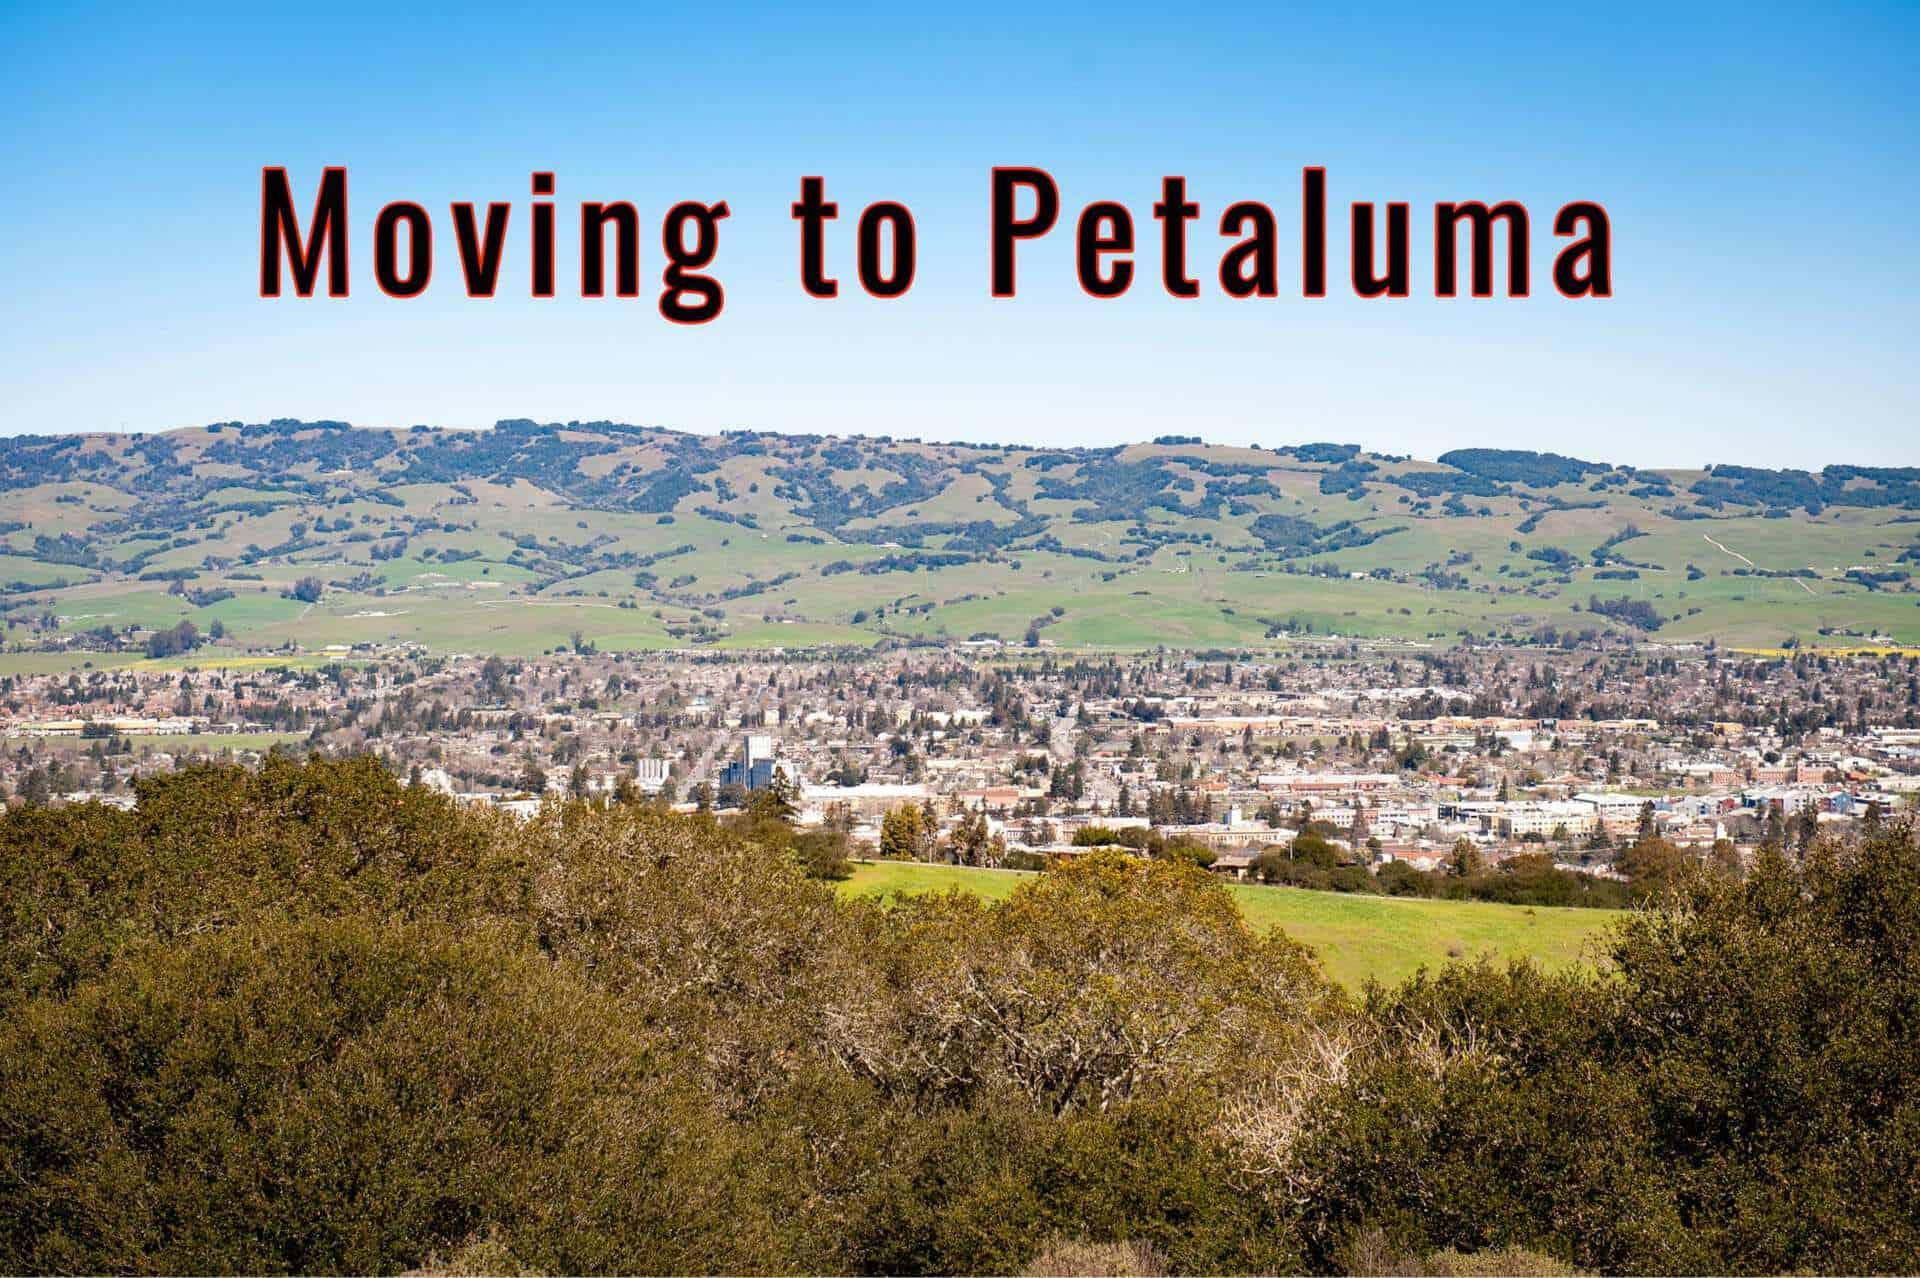 Moving to Petaluma, CA